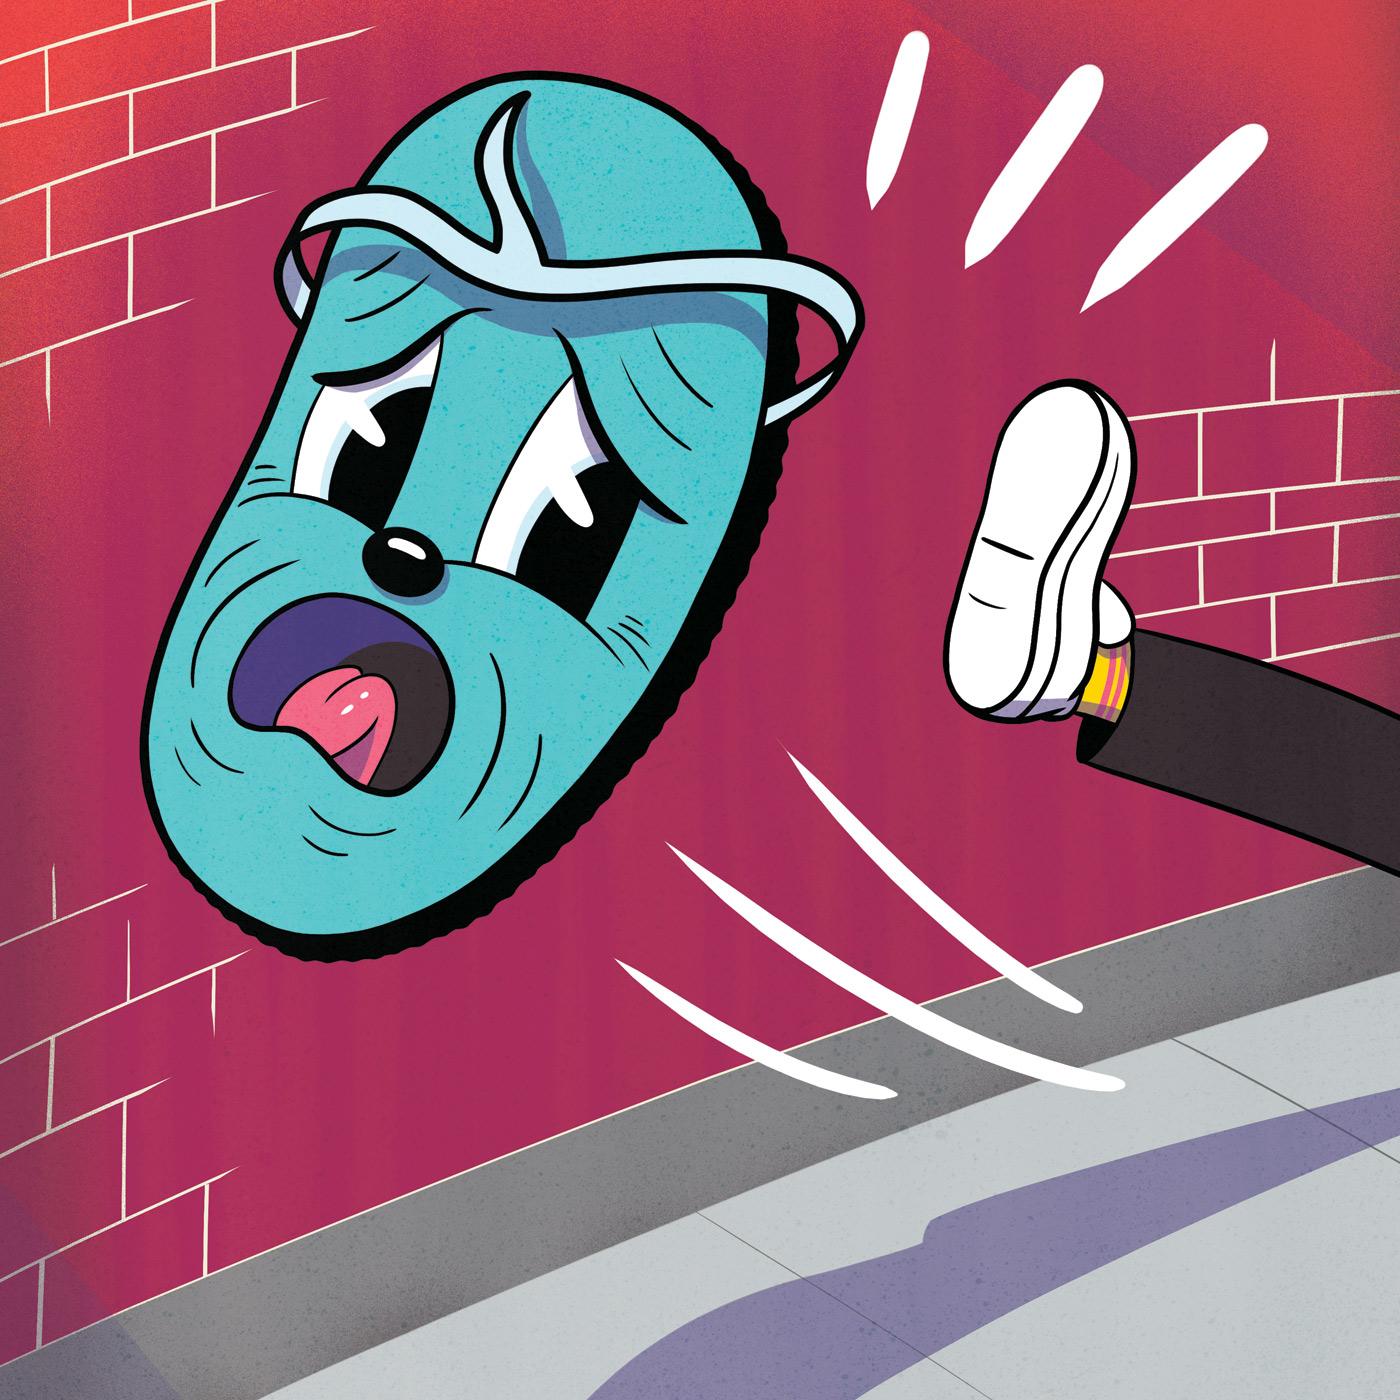 a51b83824 Why Men Should Never Wear Flip-Flops - D Magazine